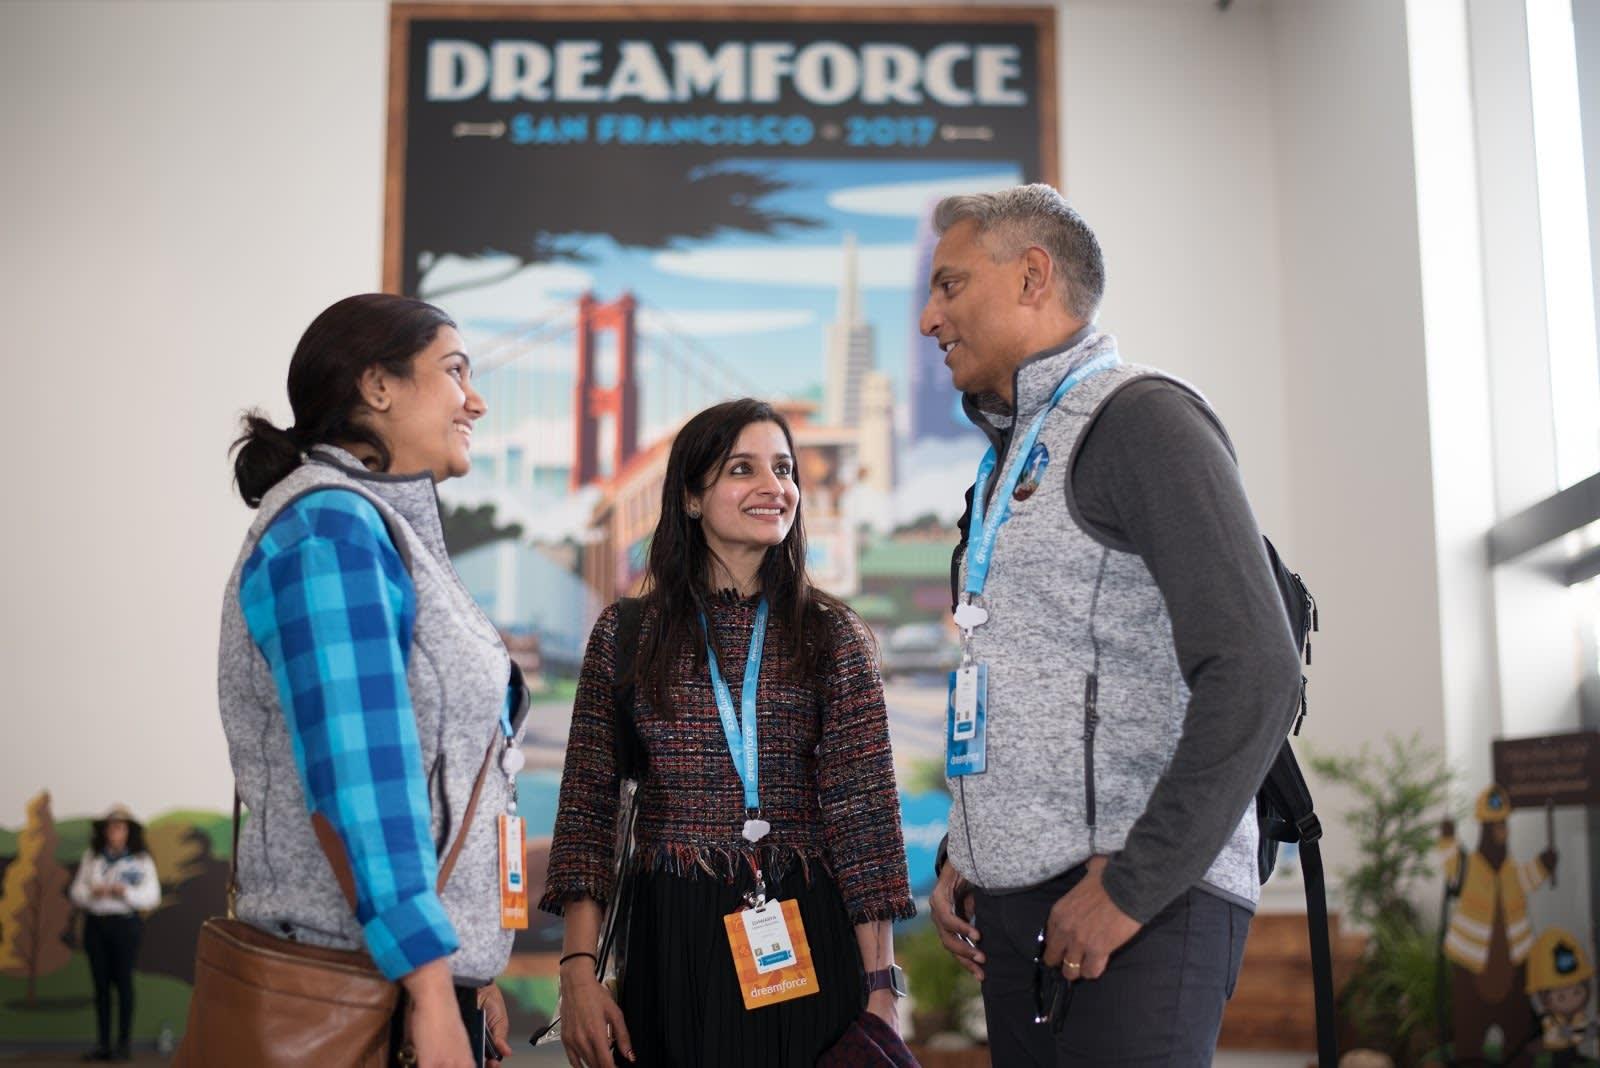 Dreamforce 2017 で交流する Trailblazer の写真